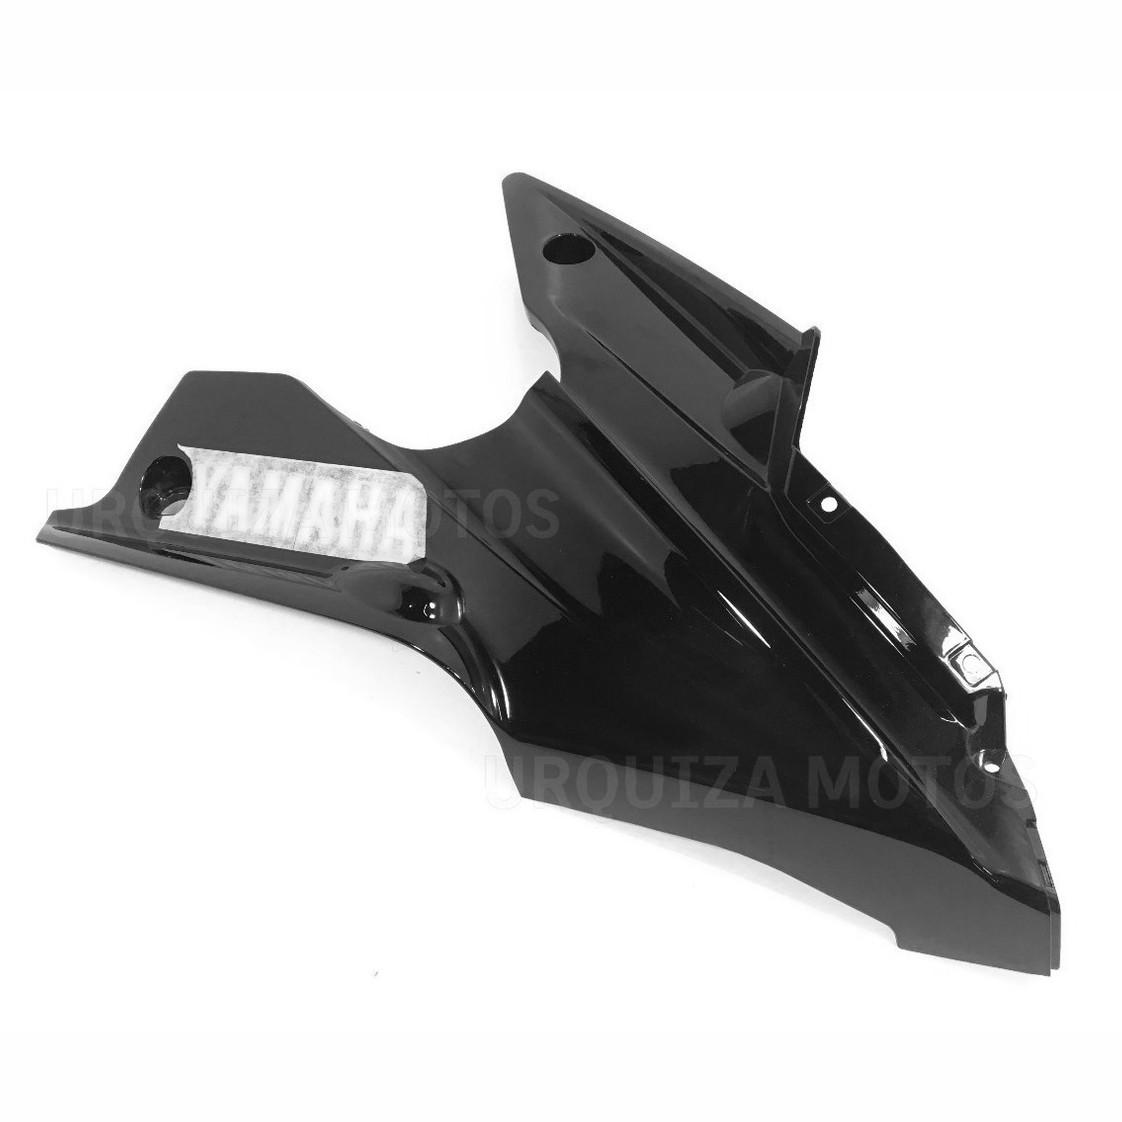 Cacha Quilla Derecha Negra Yamaha R15 Original